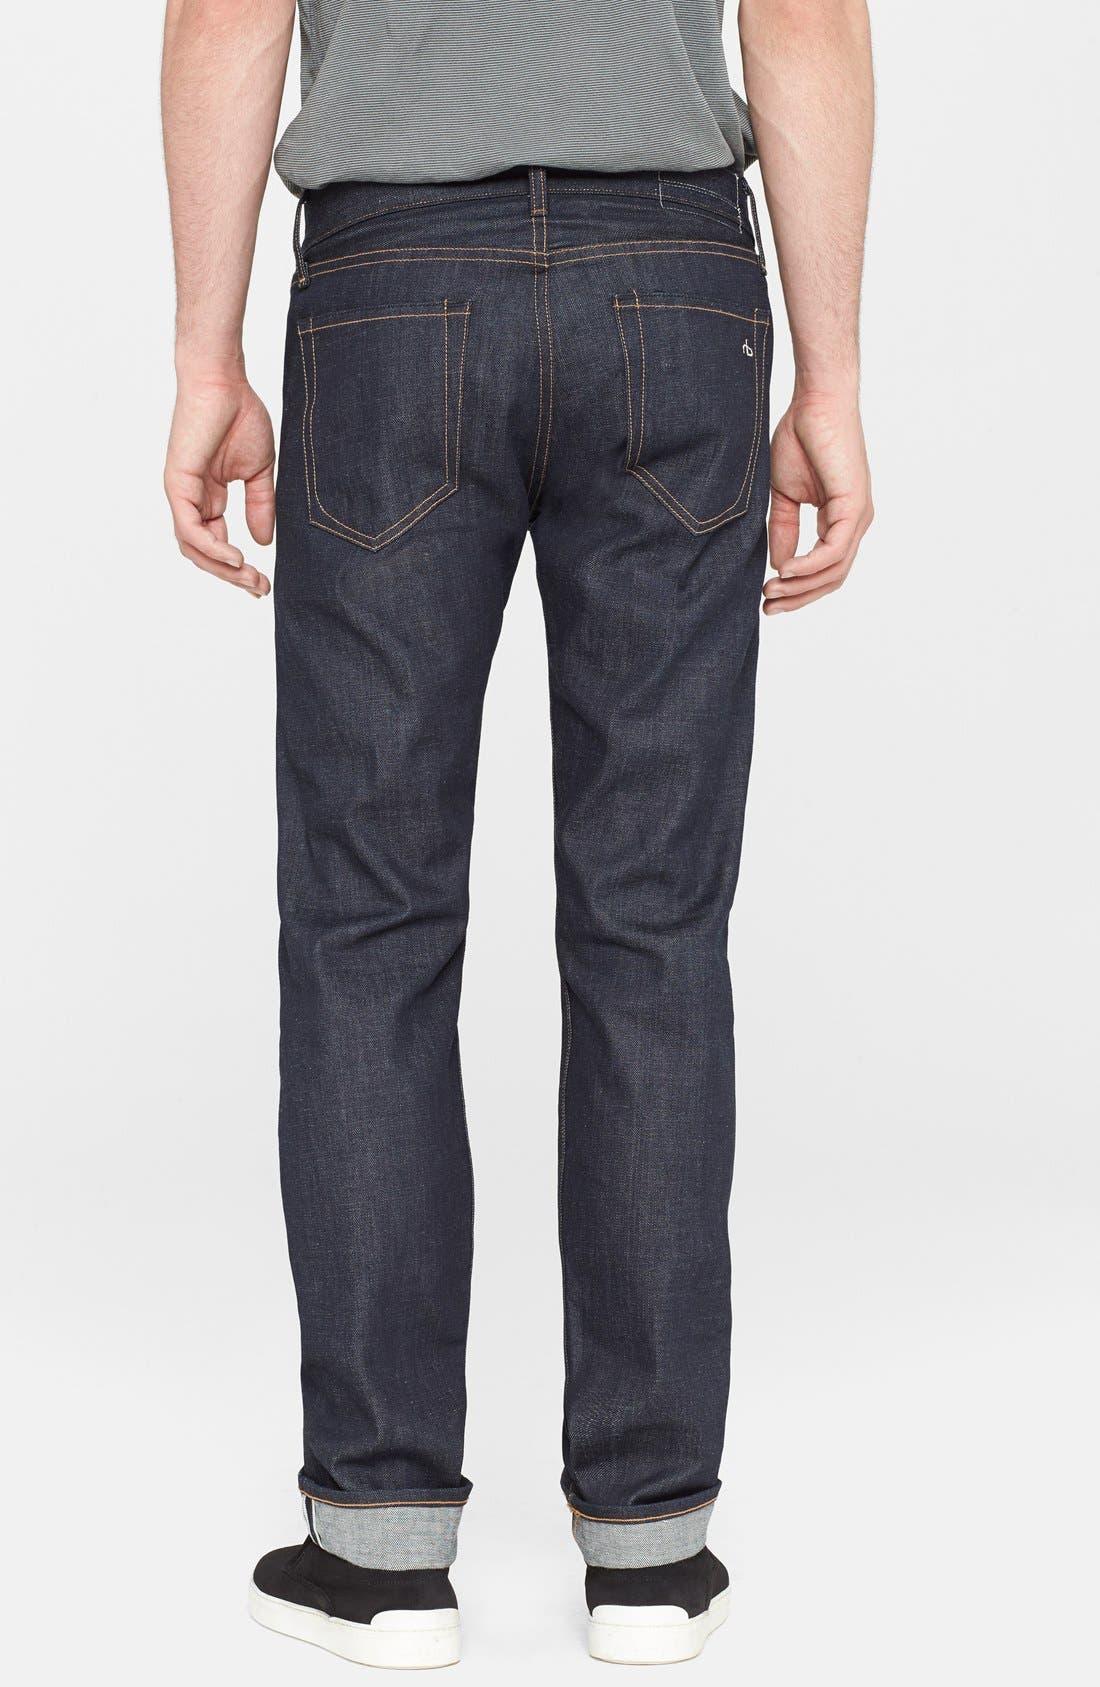 Alternate Image 2  - rag & bone Standard Issue Fit 2 Slim Fit Raw Selvedge Jeans (Indigo)